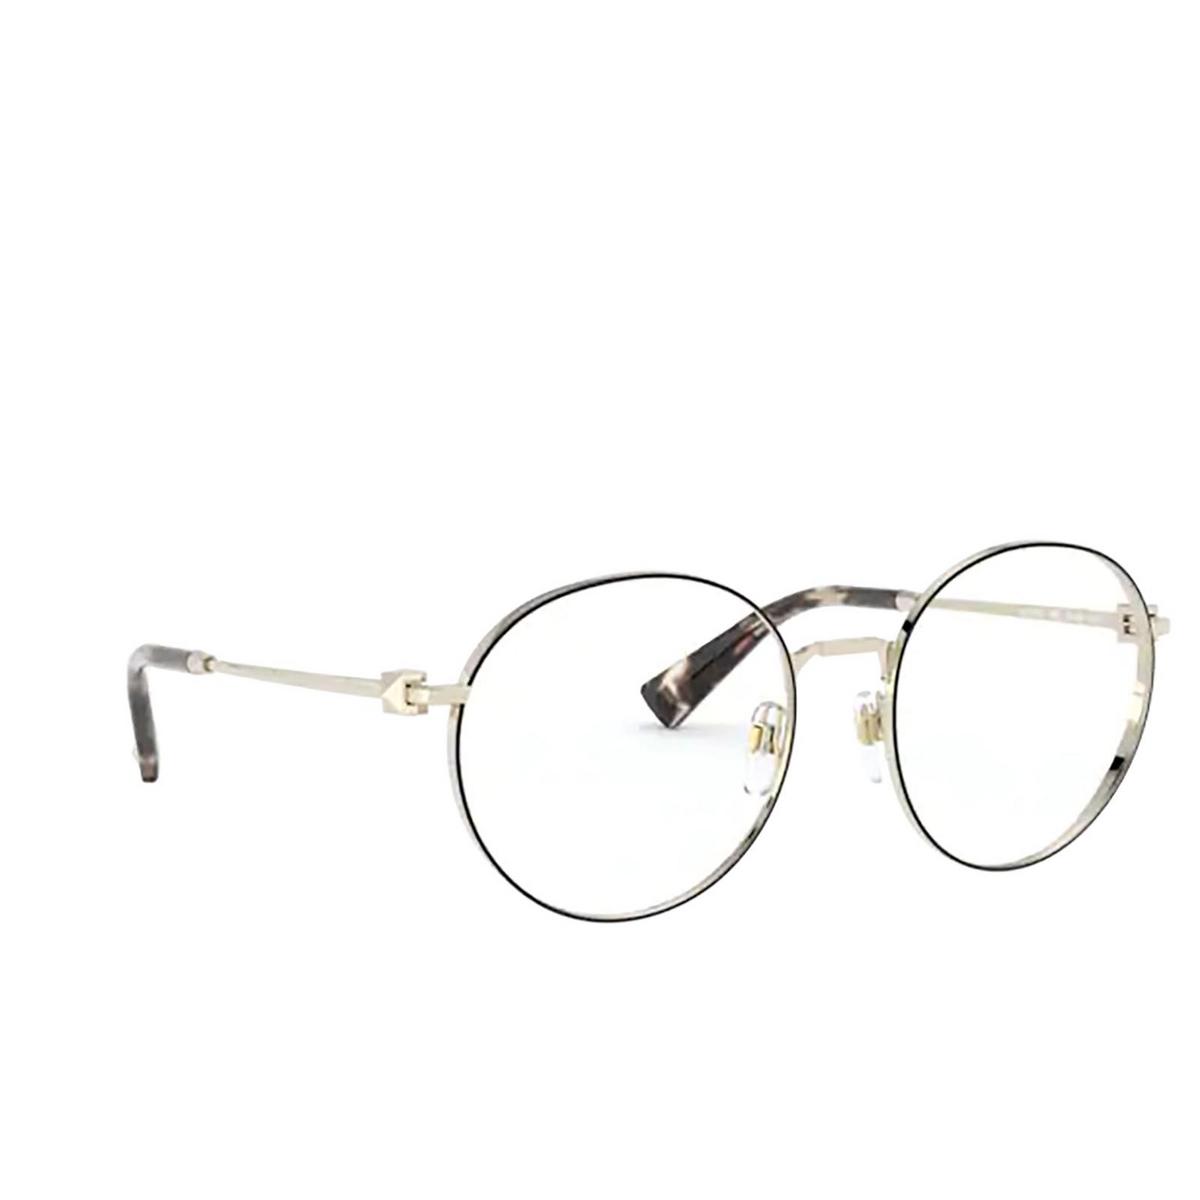 Valentino® Round Eyeglasses: VA1020 color Pale Gold / Black 3003 - three-quarters view.